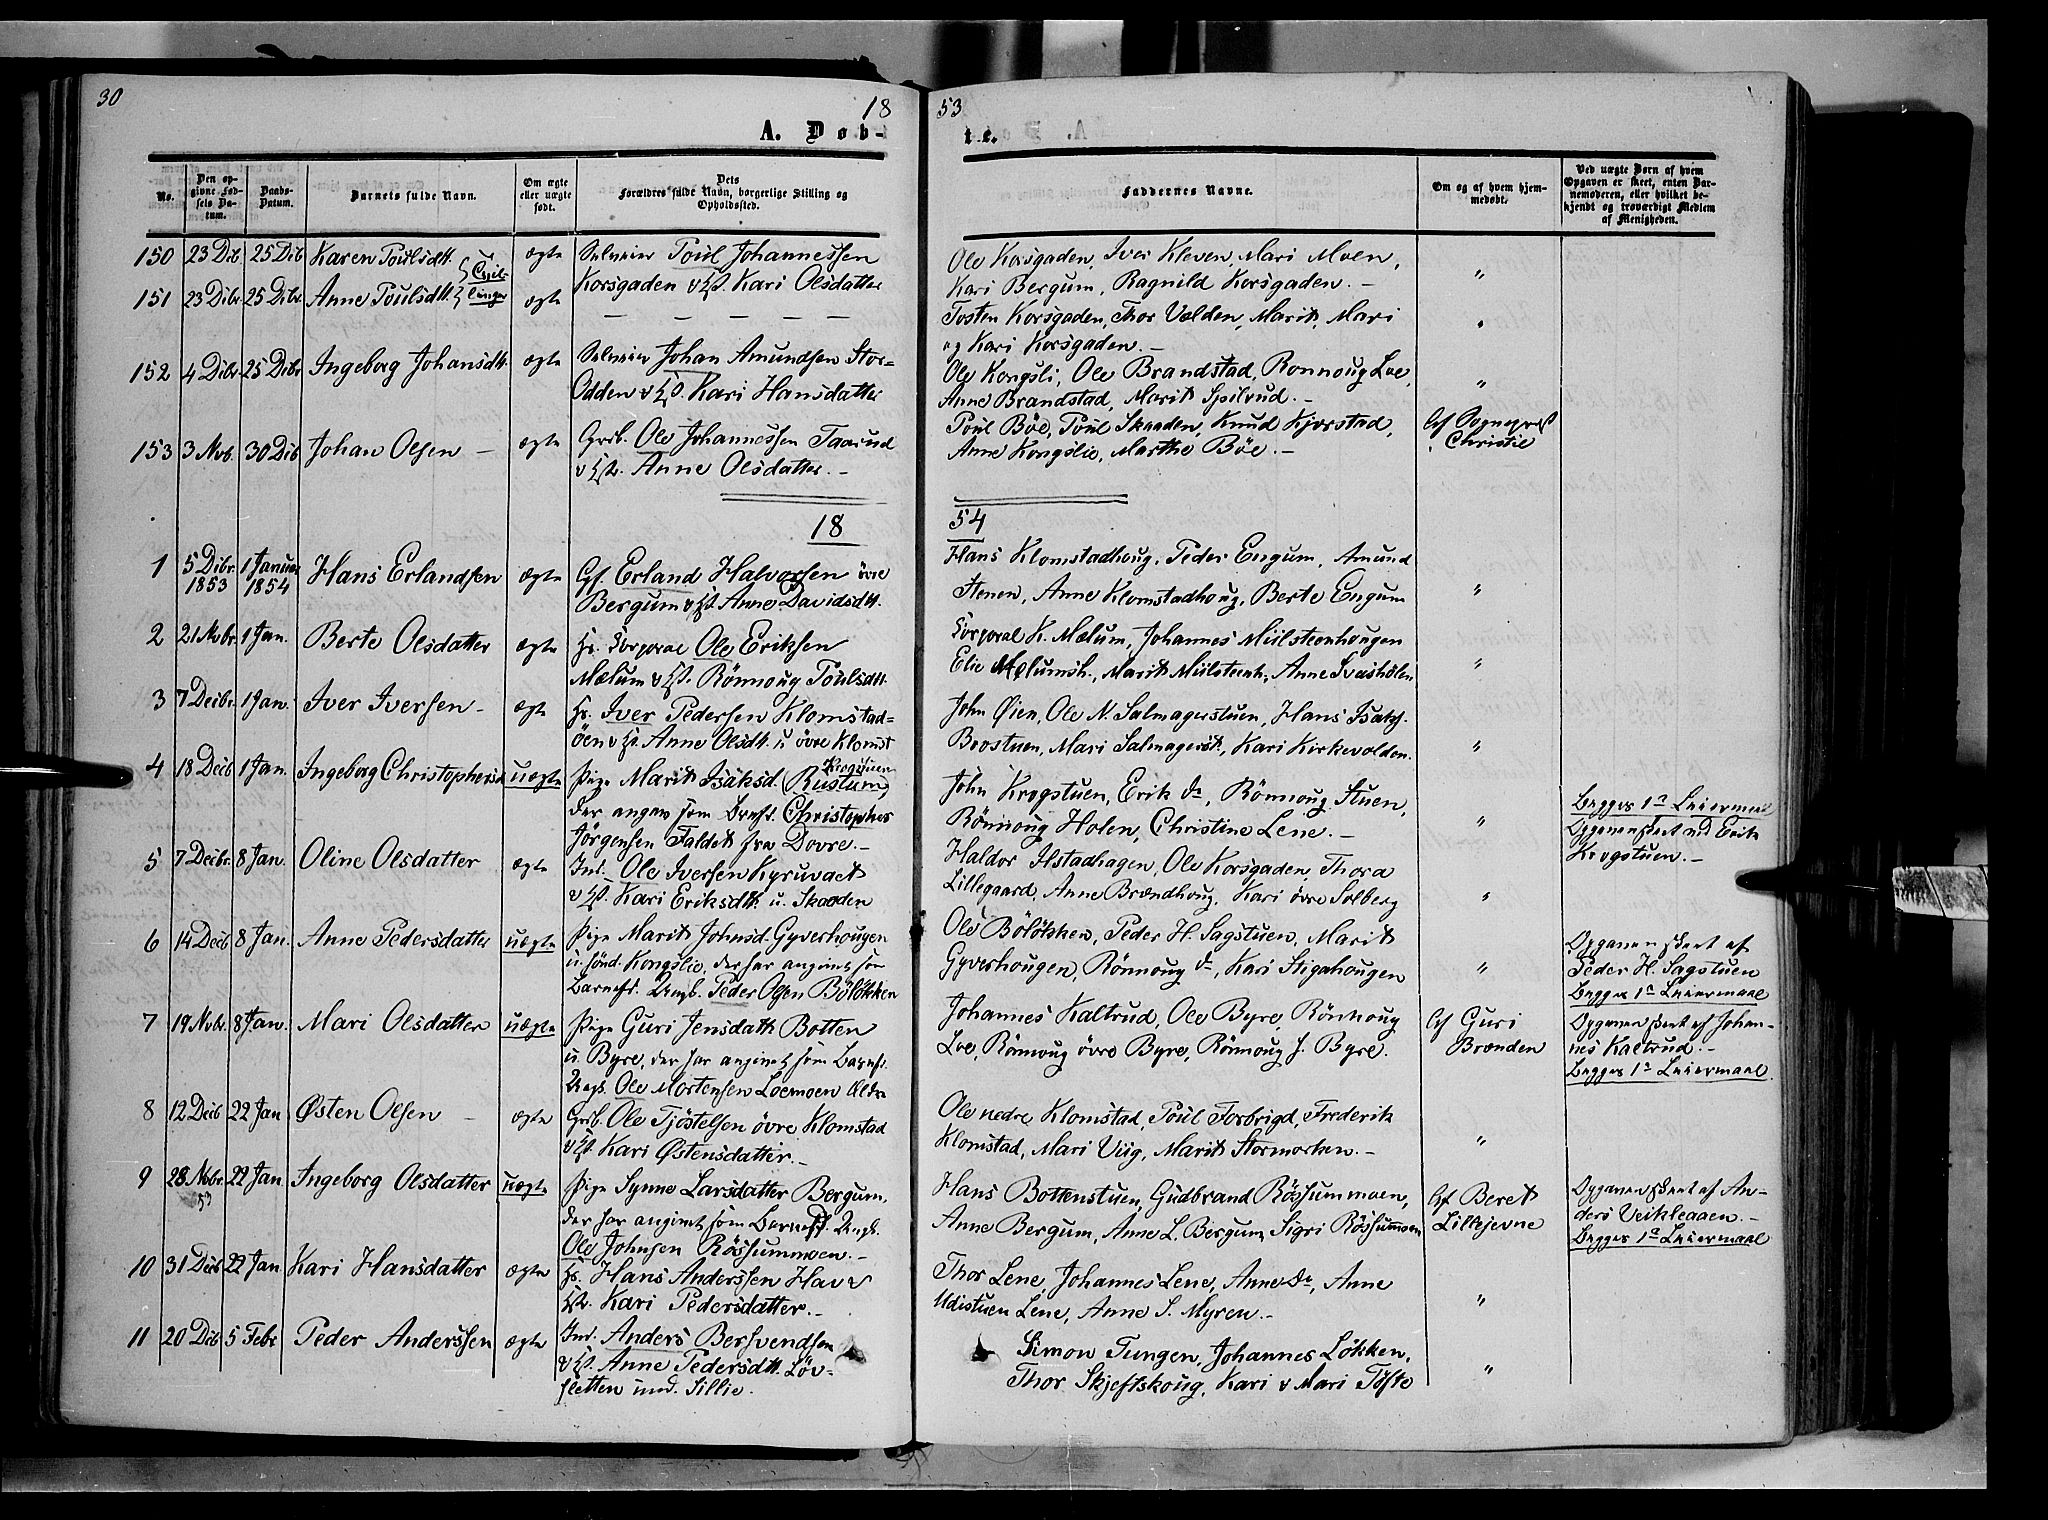 SAH, Nord-Fron prestekontor, Ministerialbok nr. 1, 1851-1864, s. 30